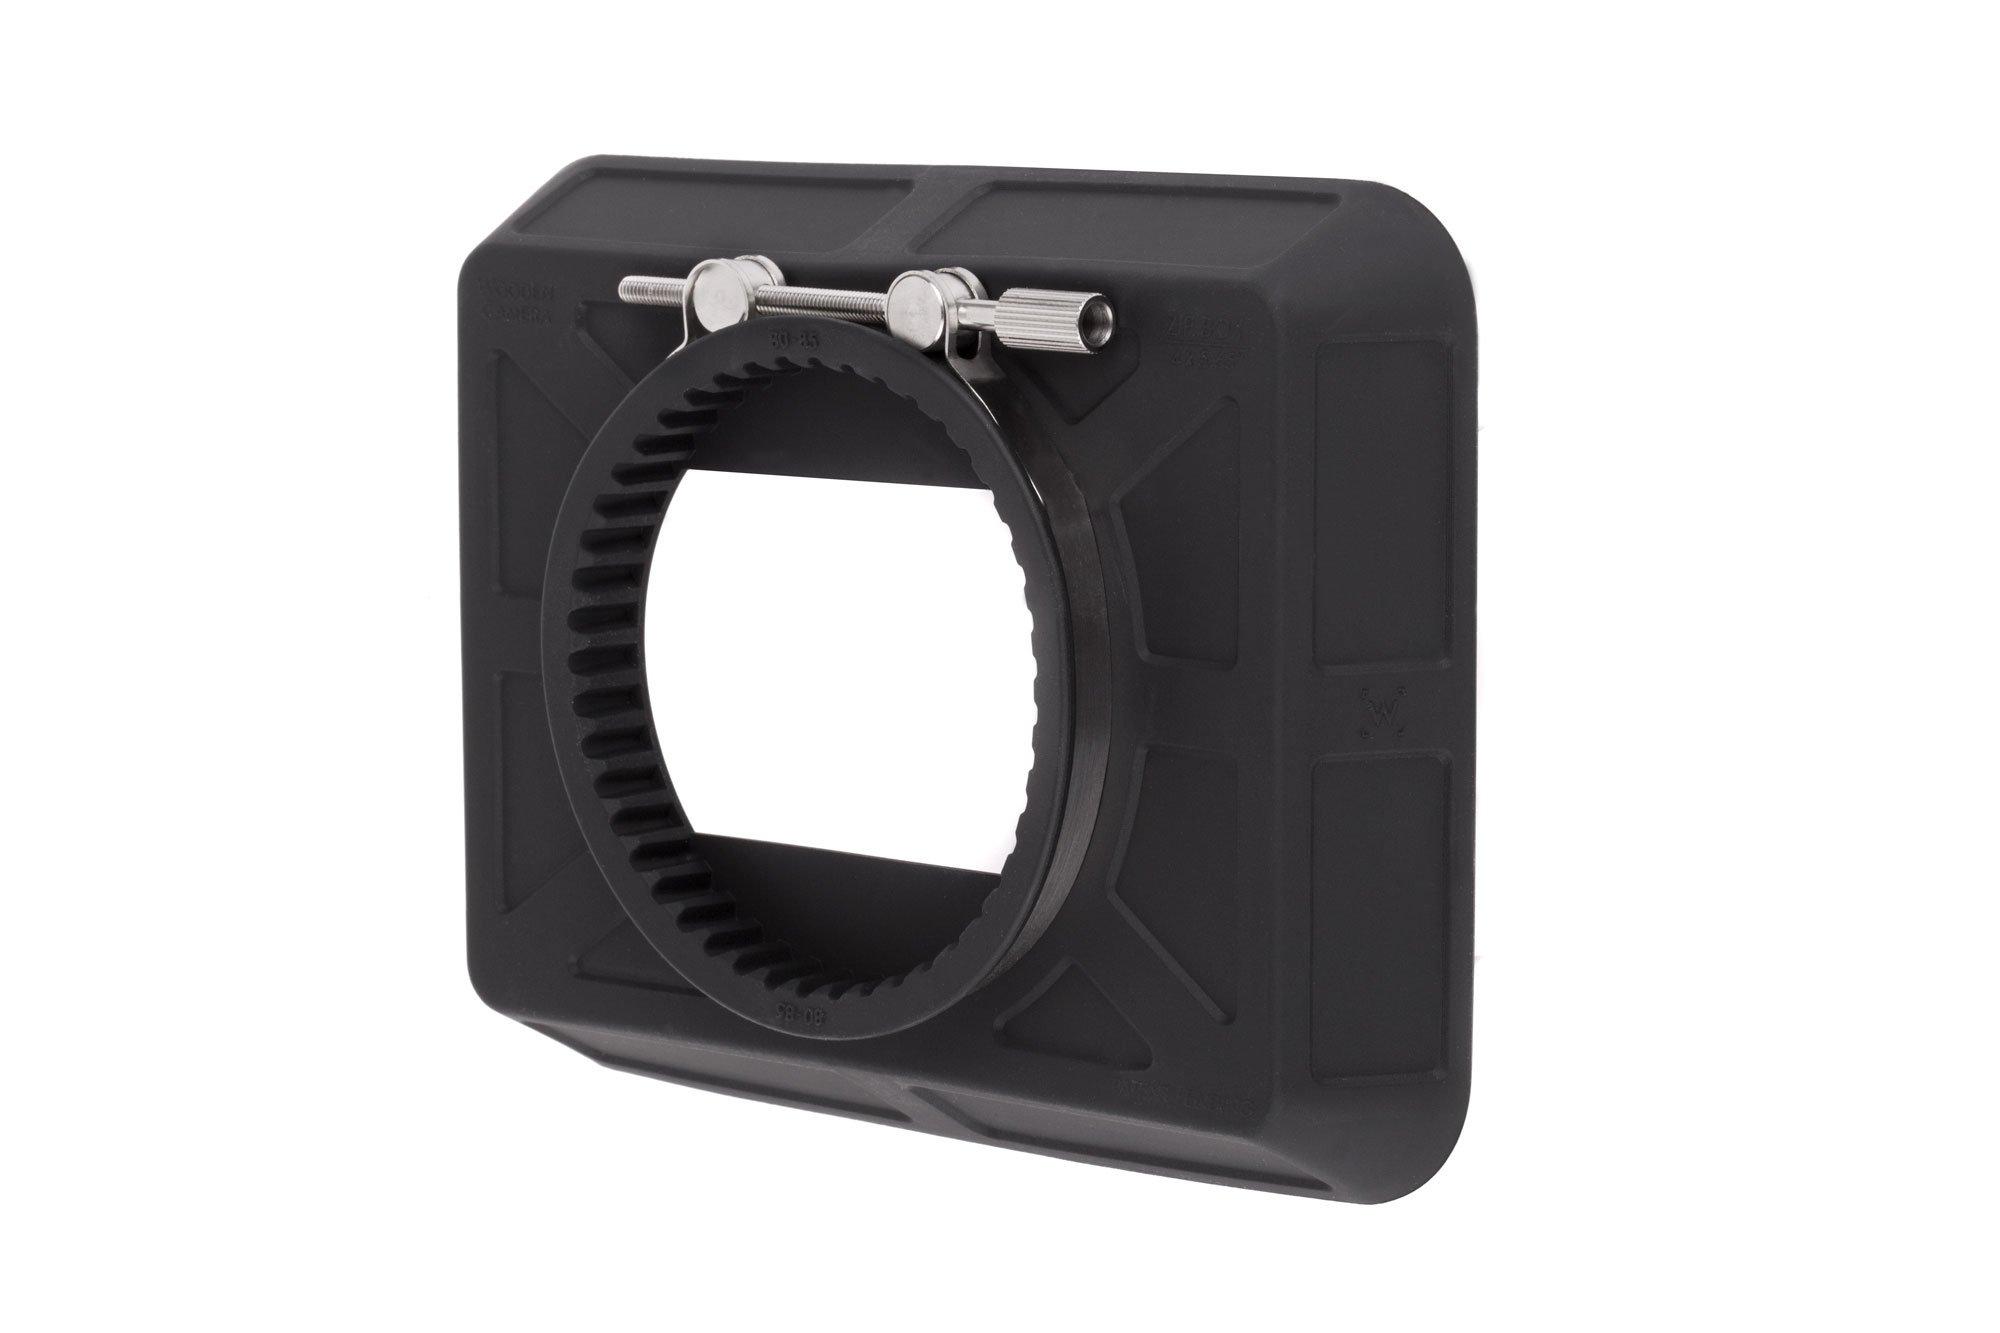 Wooden Camera - Zip Box Double 4x5.65 (80-85mm)